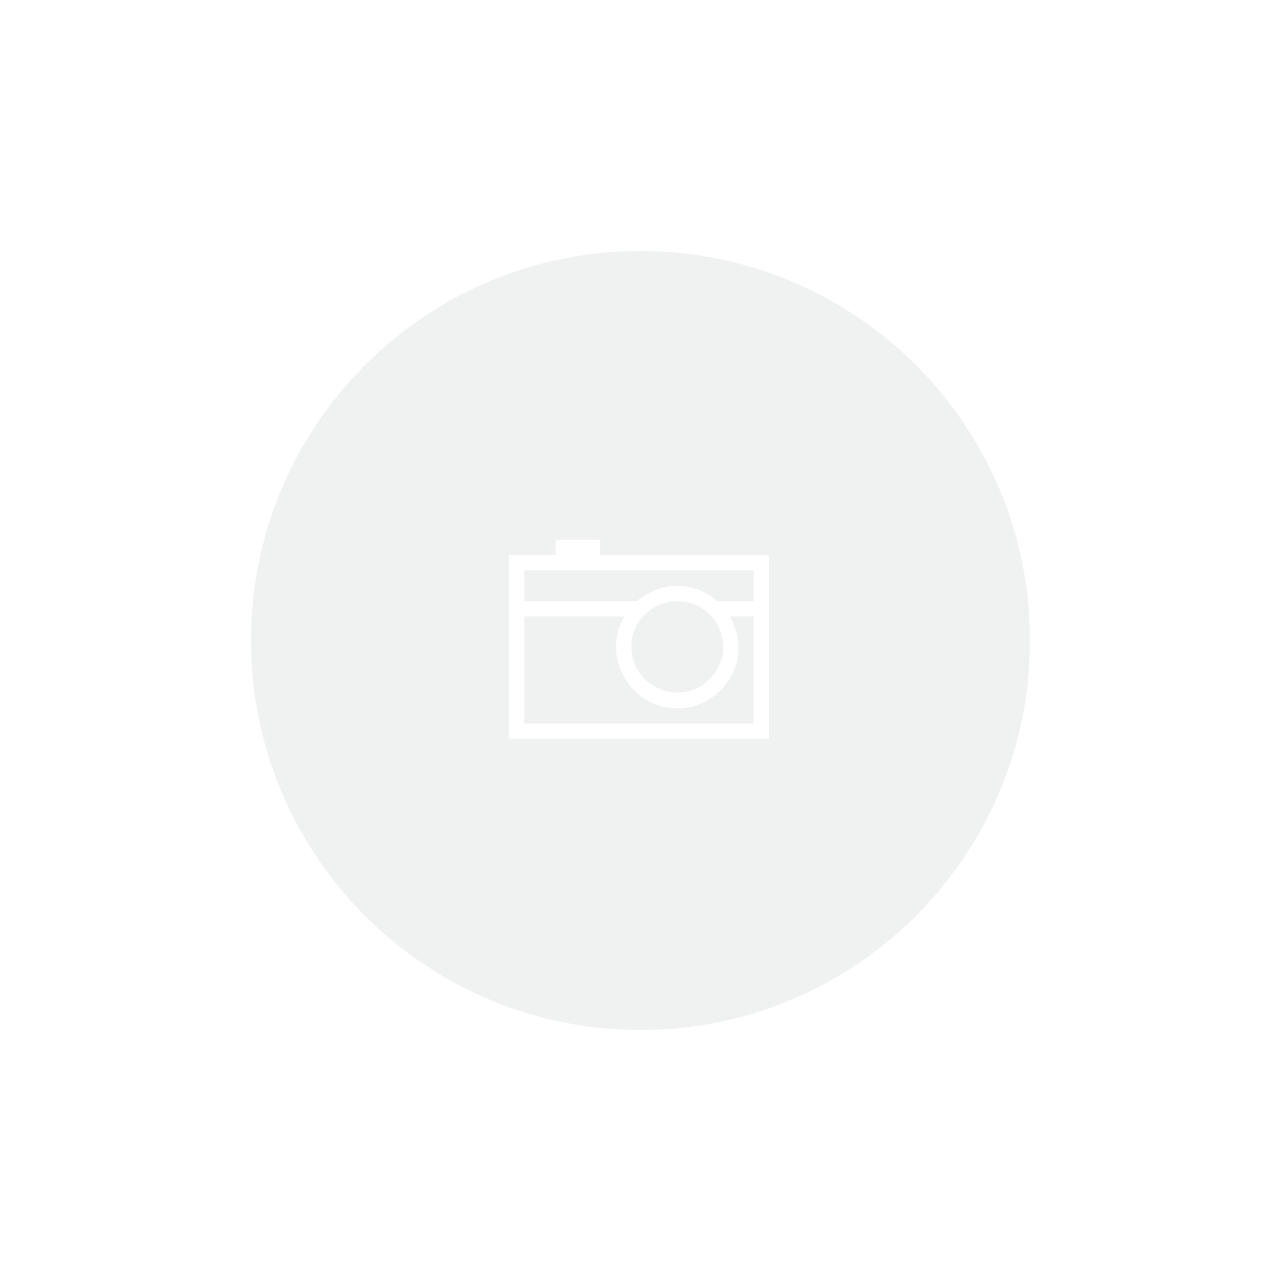 Bandeja Bruxelas Branco 35 cm